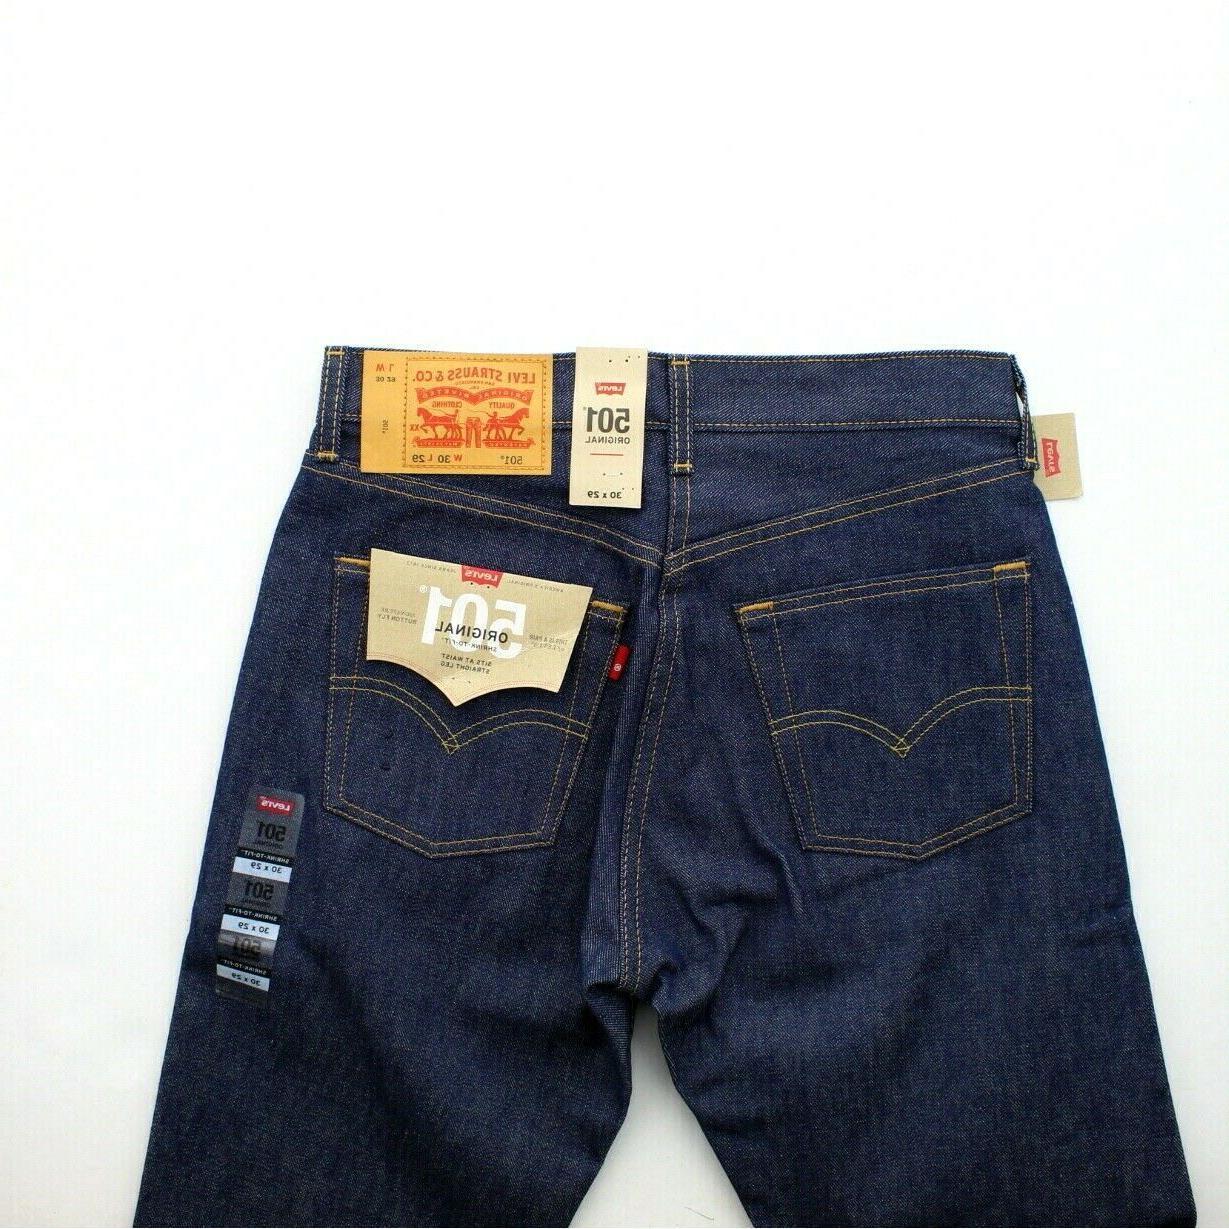 Levi's Jeans Men's Shrink Leg Denim Rigid Indigo, $59